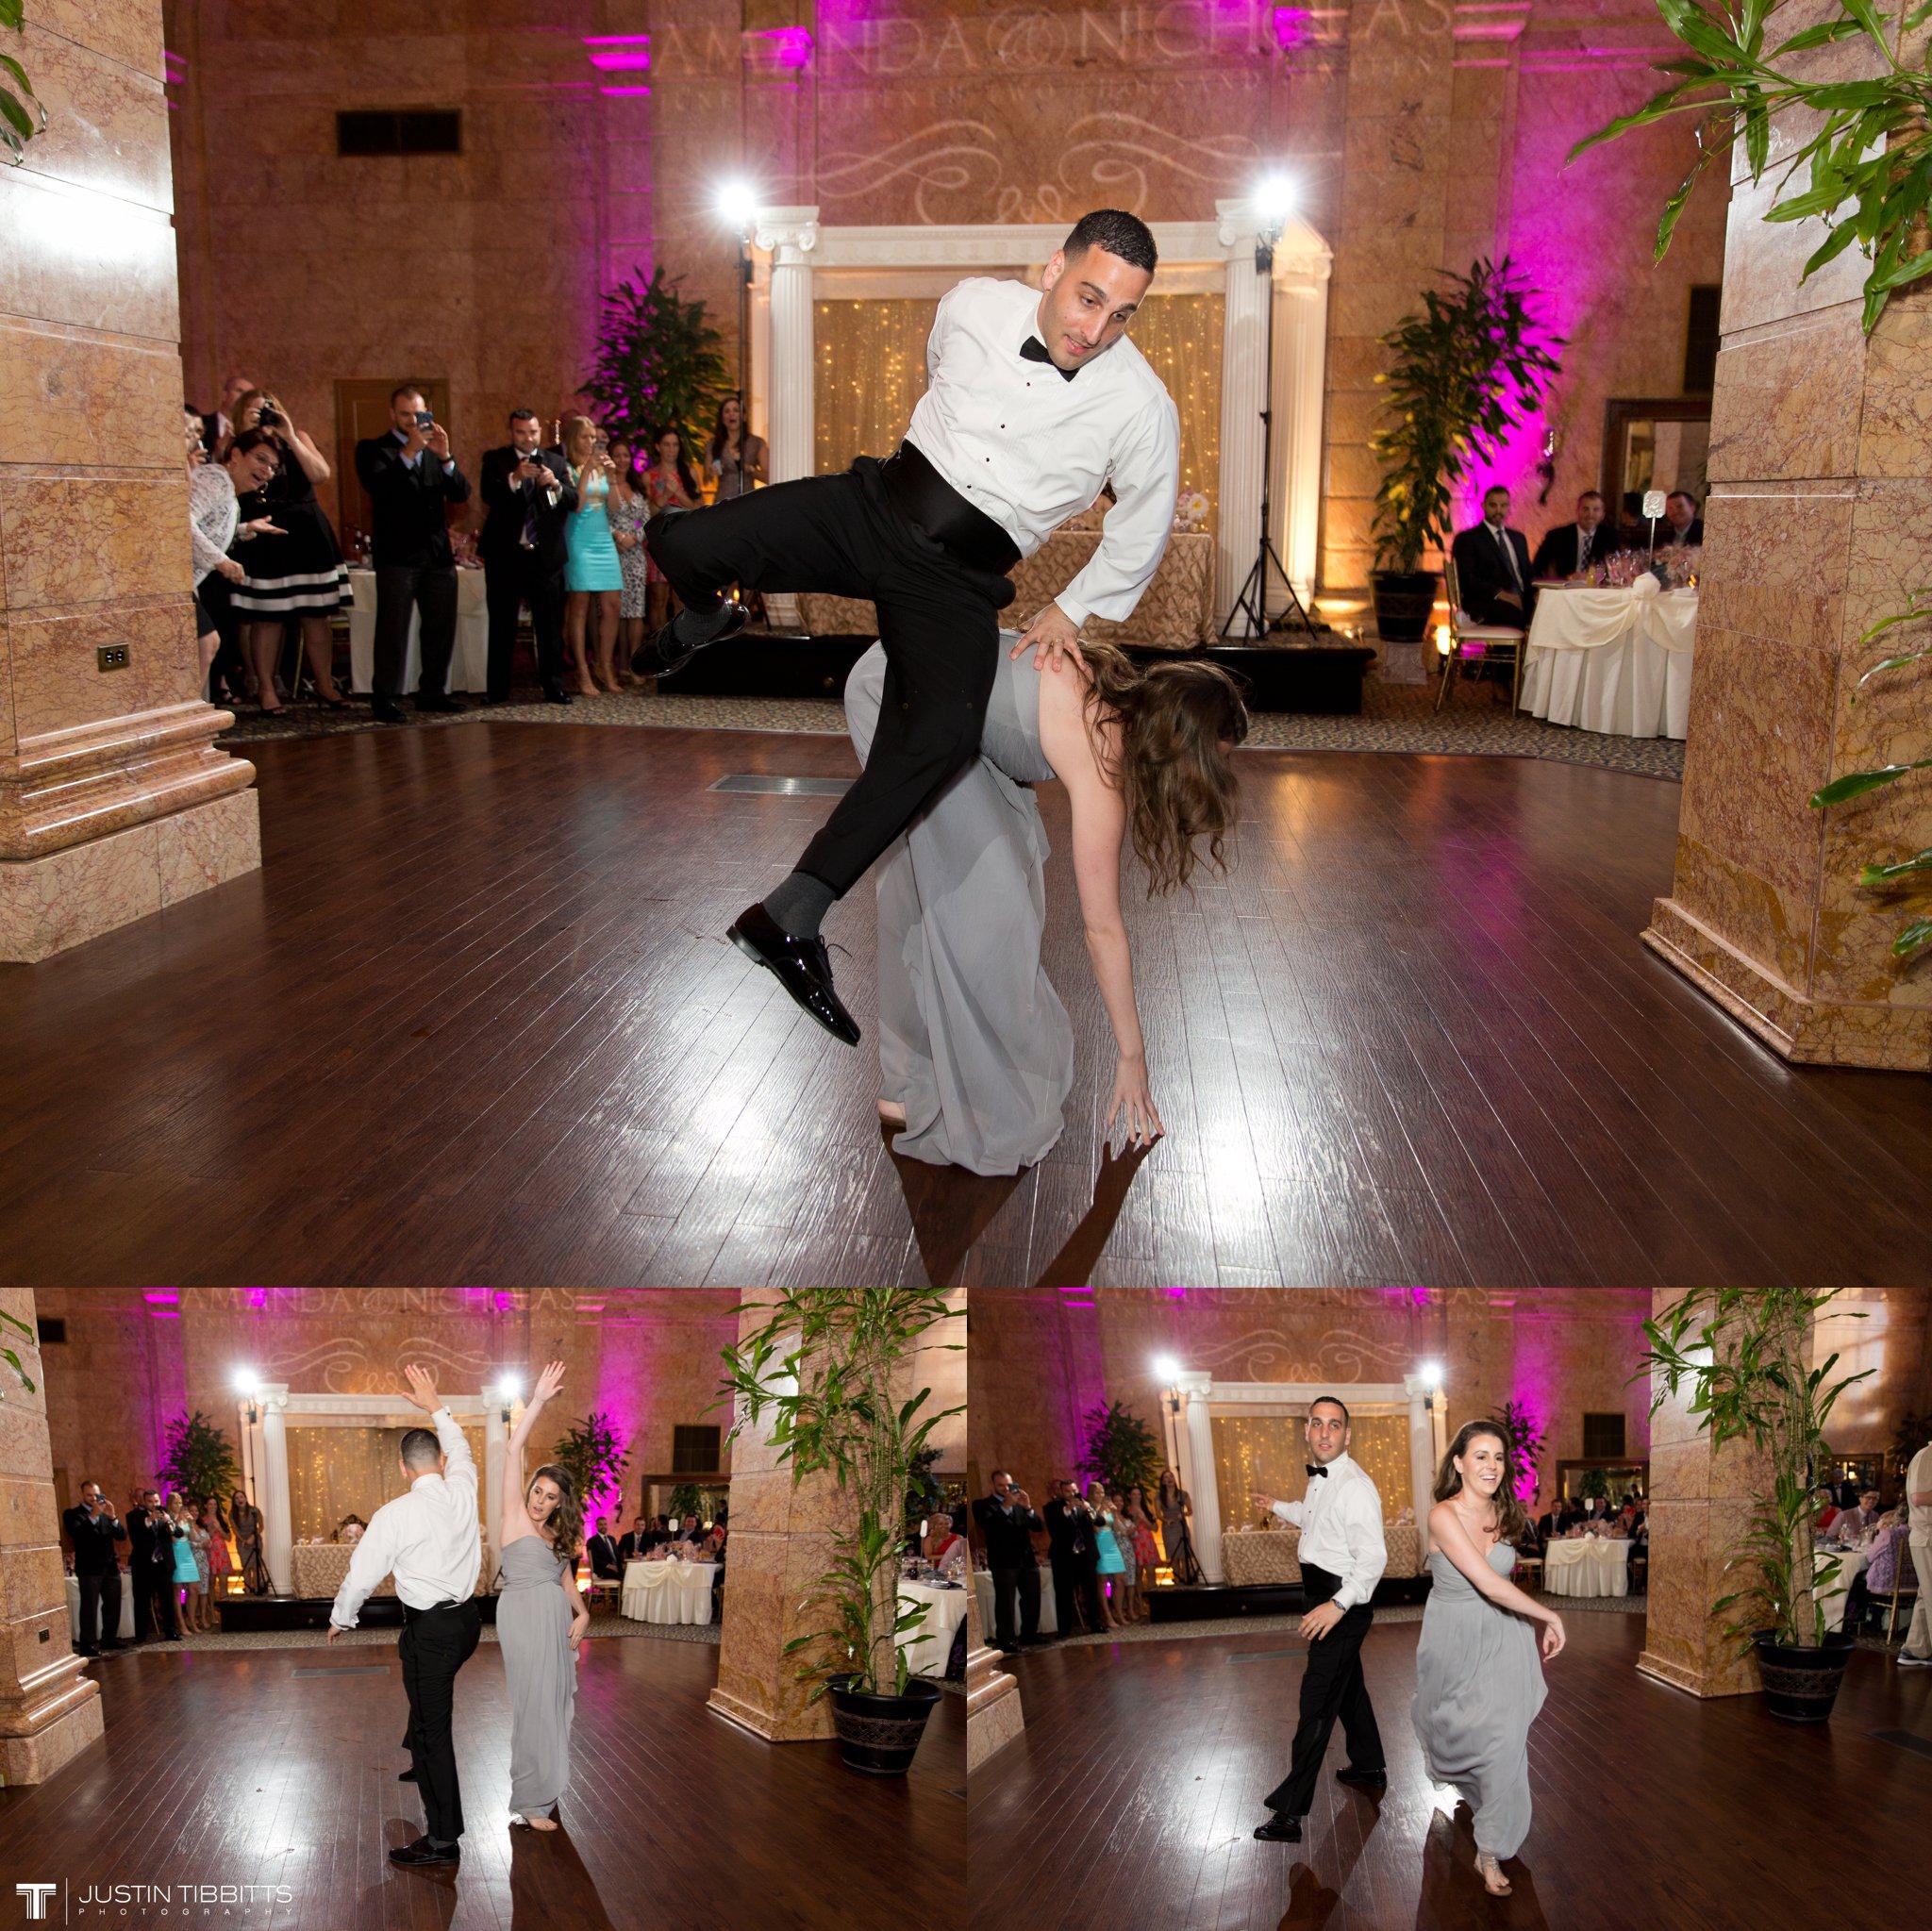 state-room-wedding-photos-with-amanda-and-nick_0145